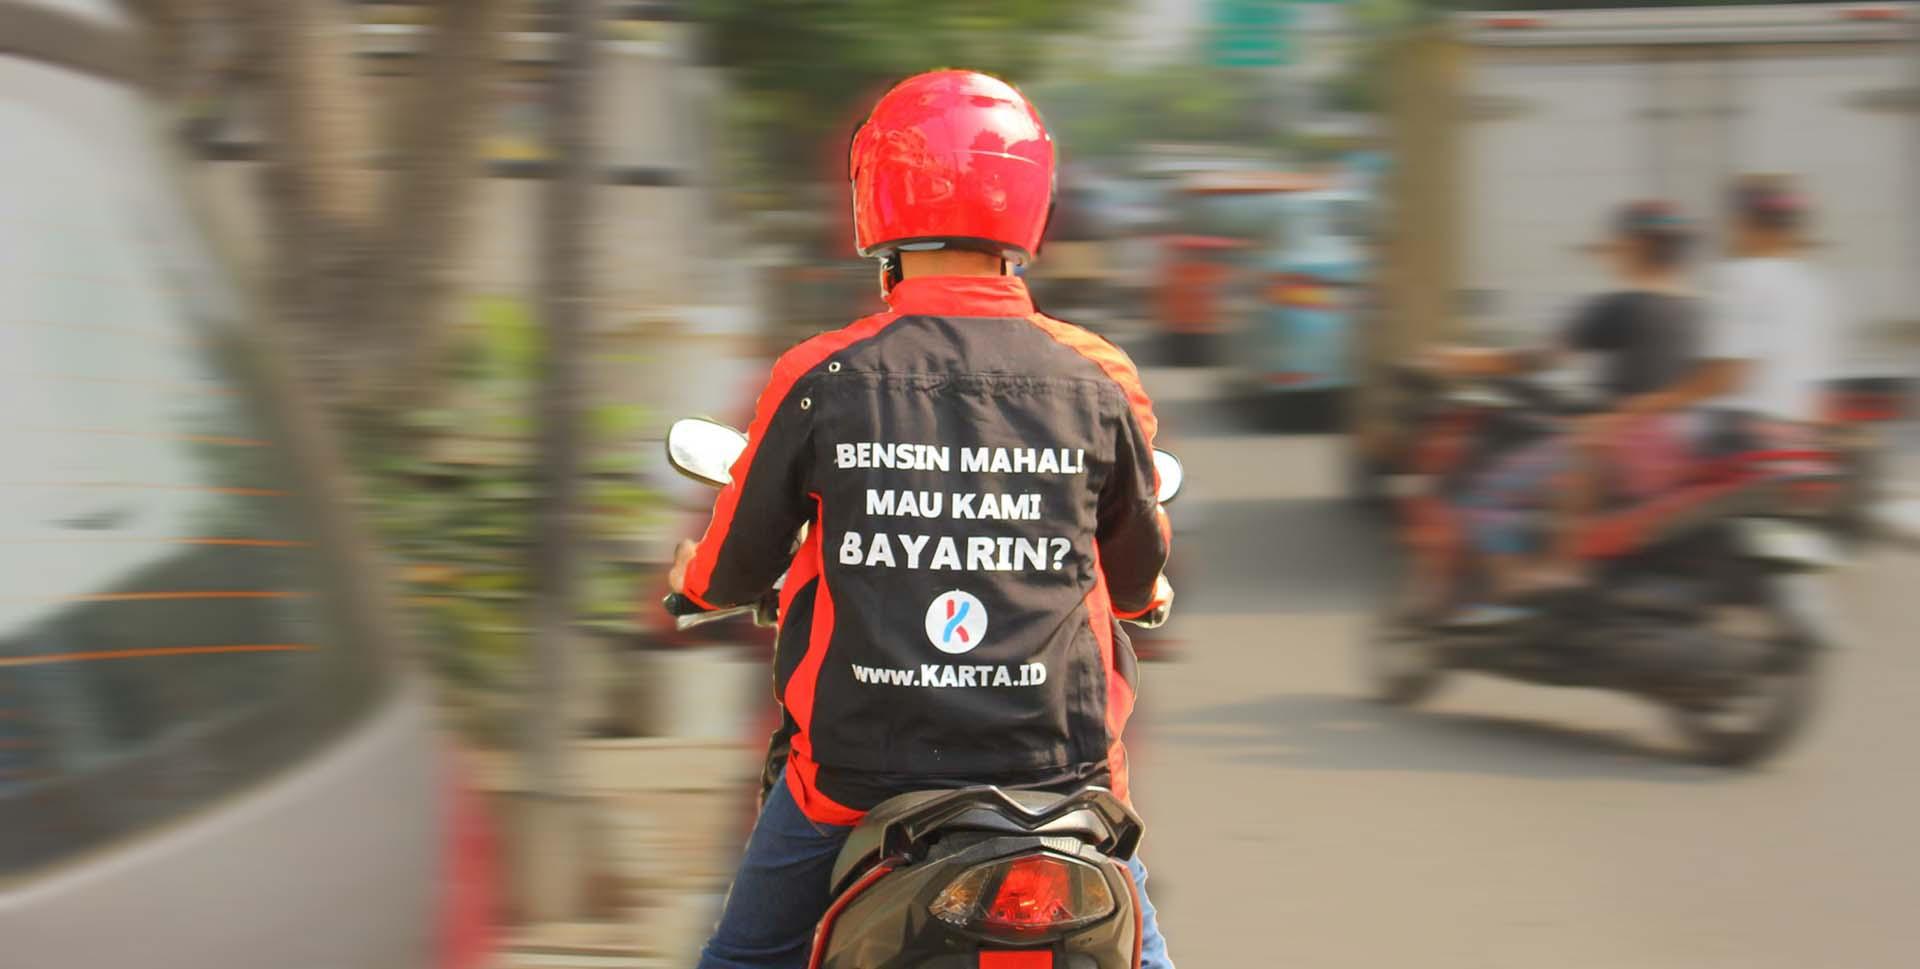 bensin karta Karta launches a motorcycle advertising service in Jakarta bensin karta